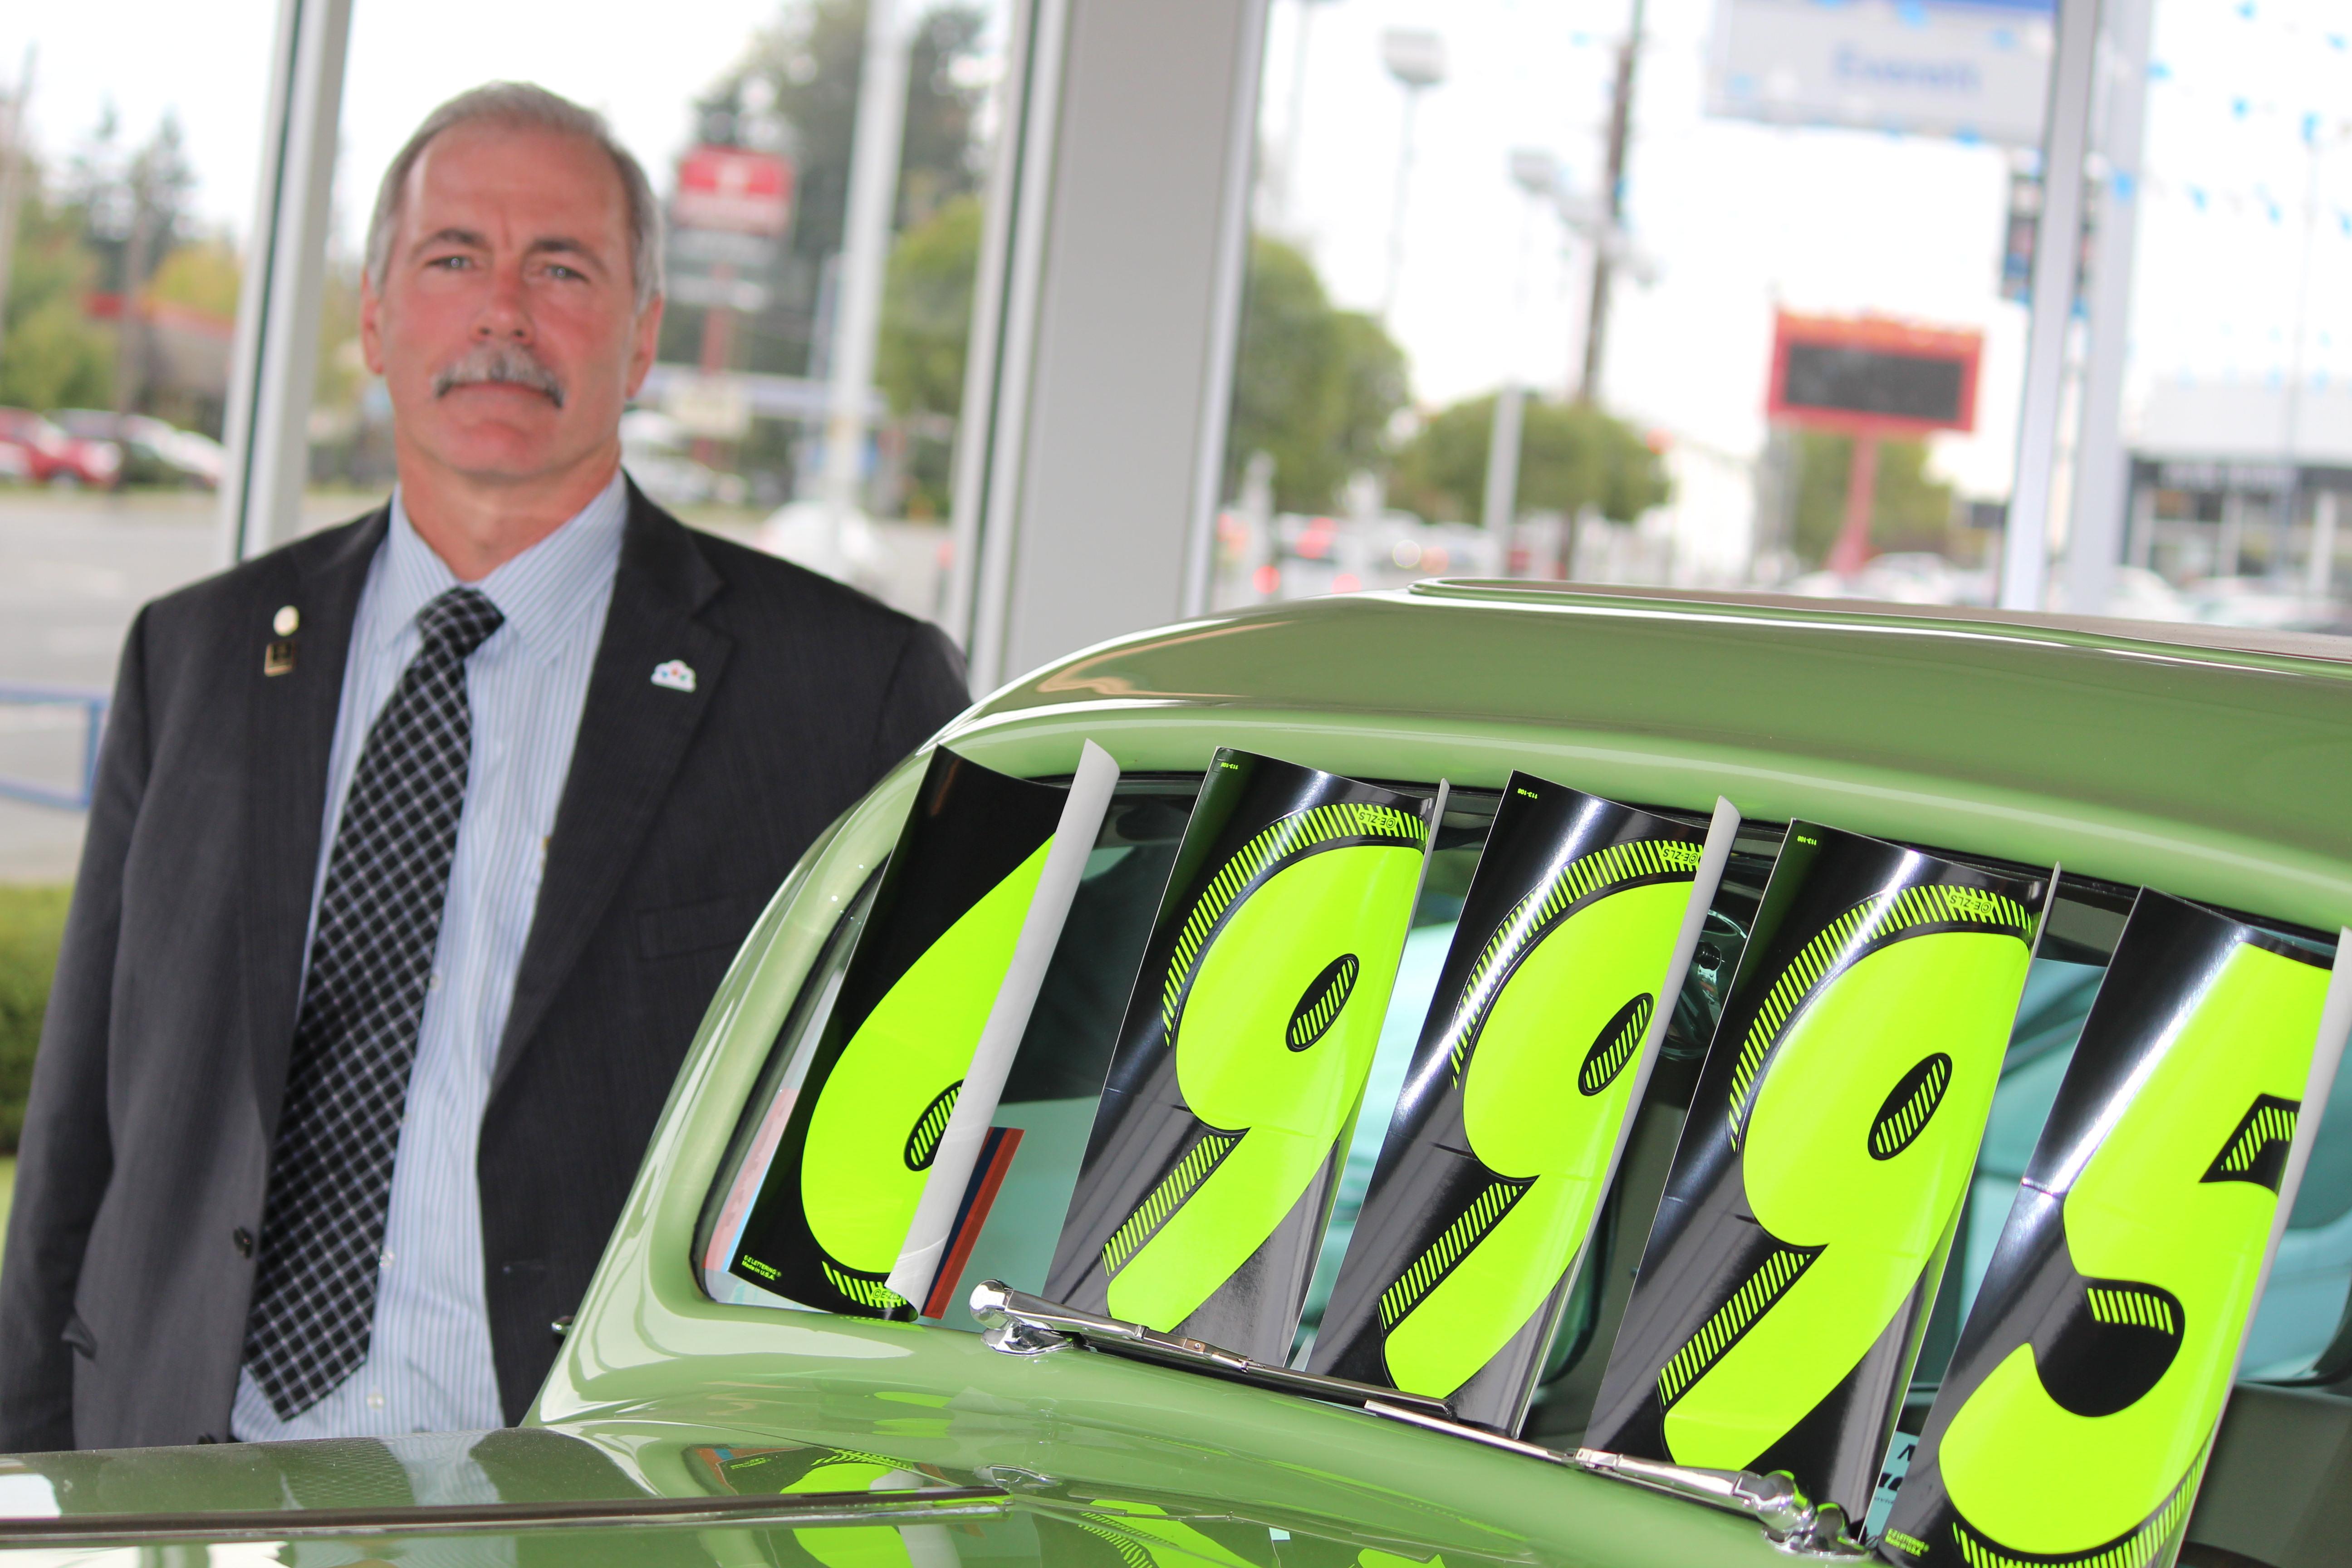 Hyundai Of Everett >> Everett Hyundai Dealer Selling 70 000 00 Used Car Myeverettnews Com